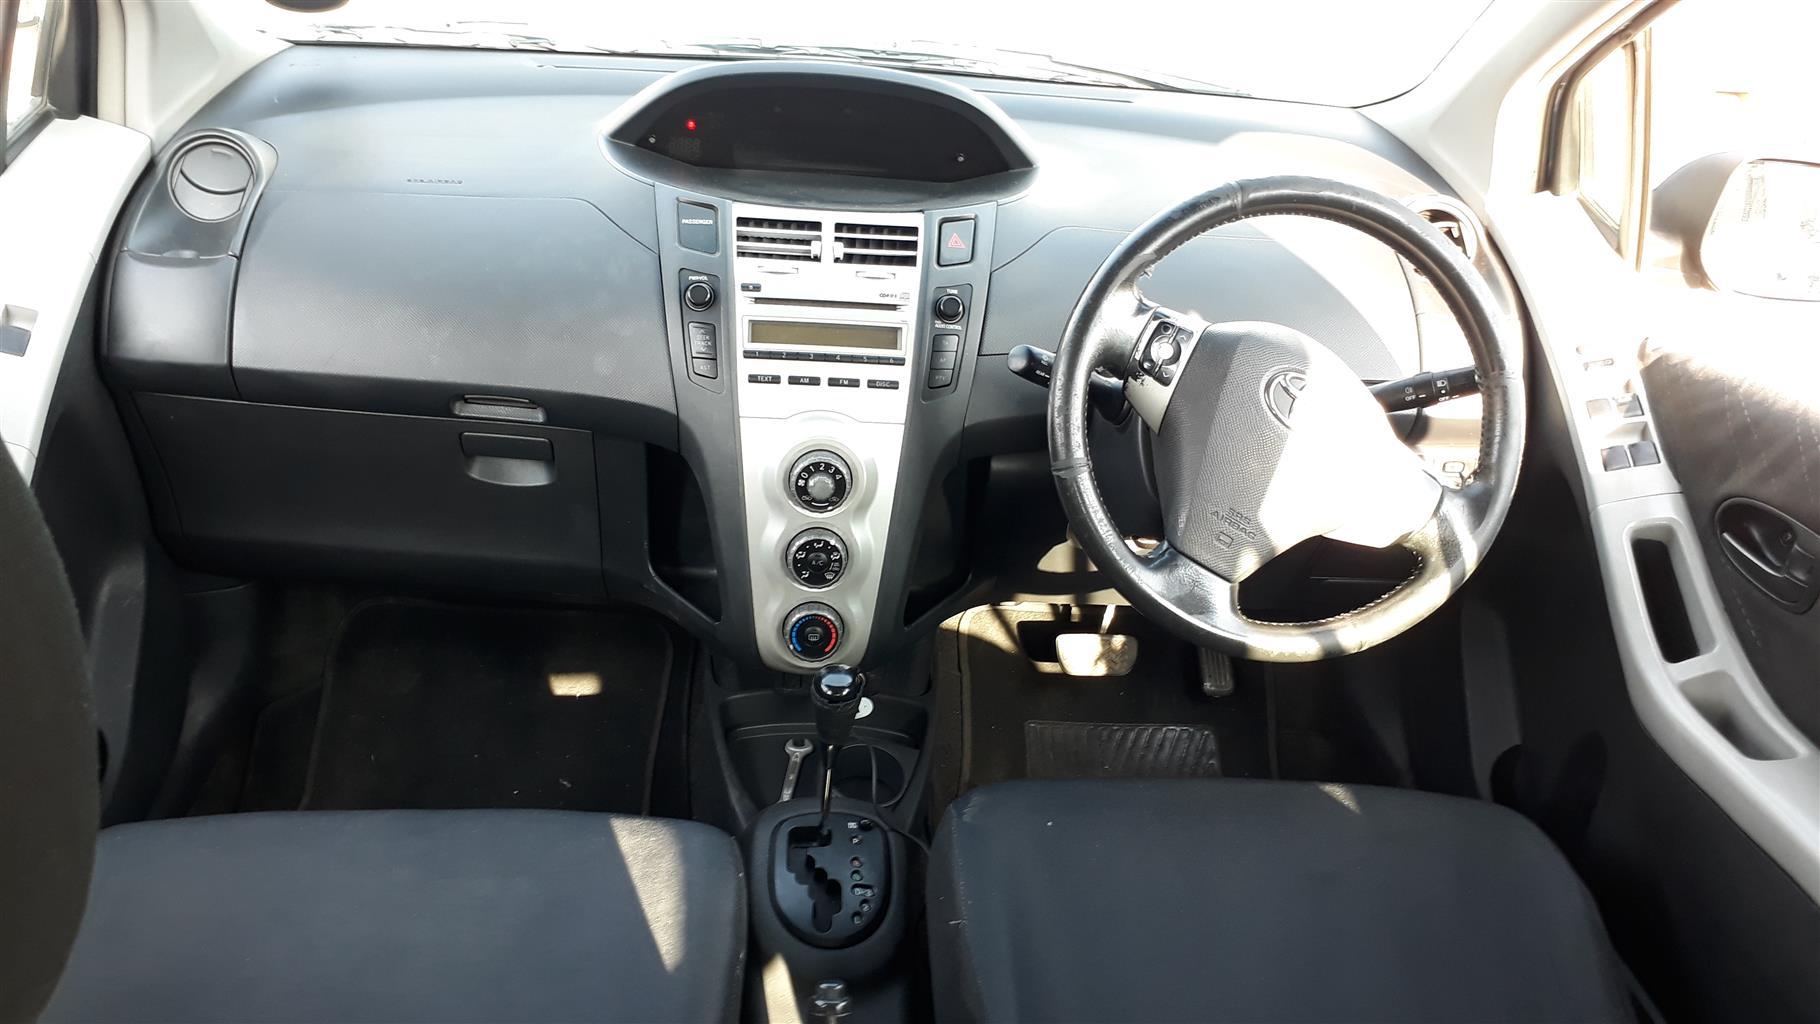 2006 Toyota Yaris 1.3 5 door T3+ automatic